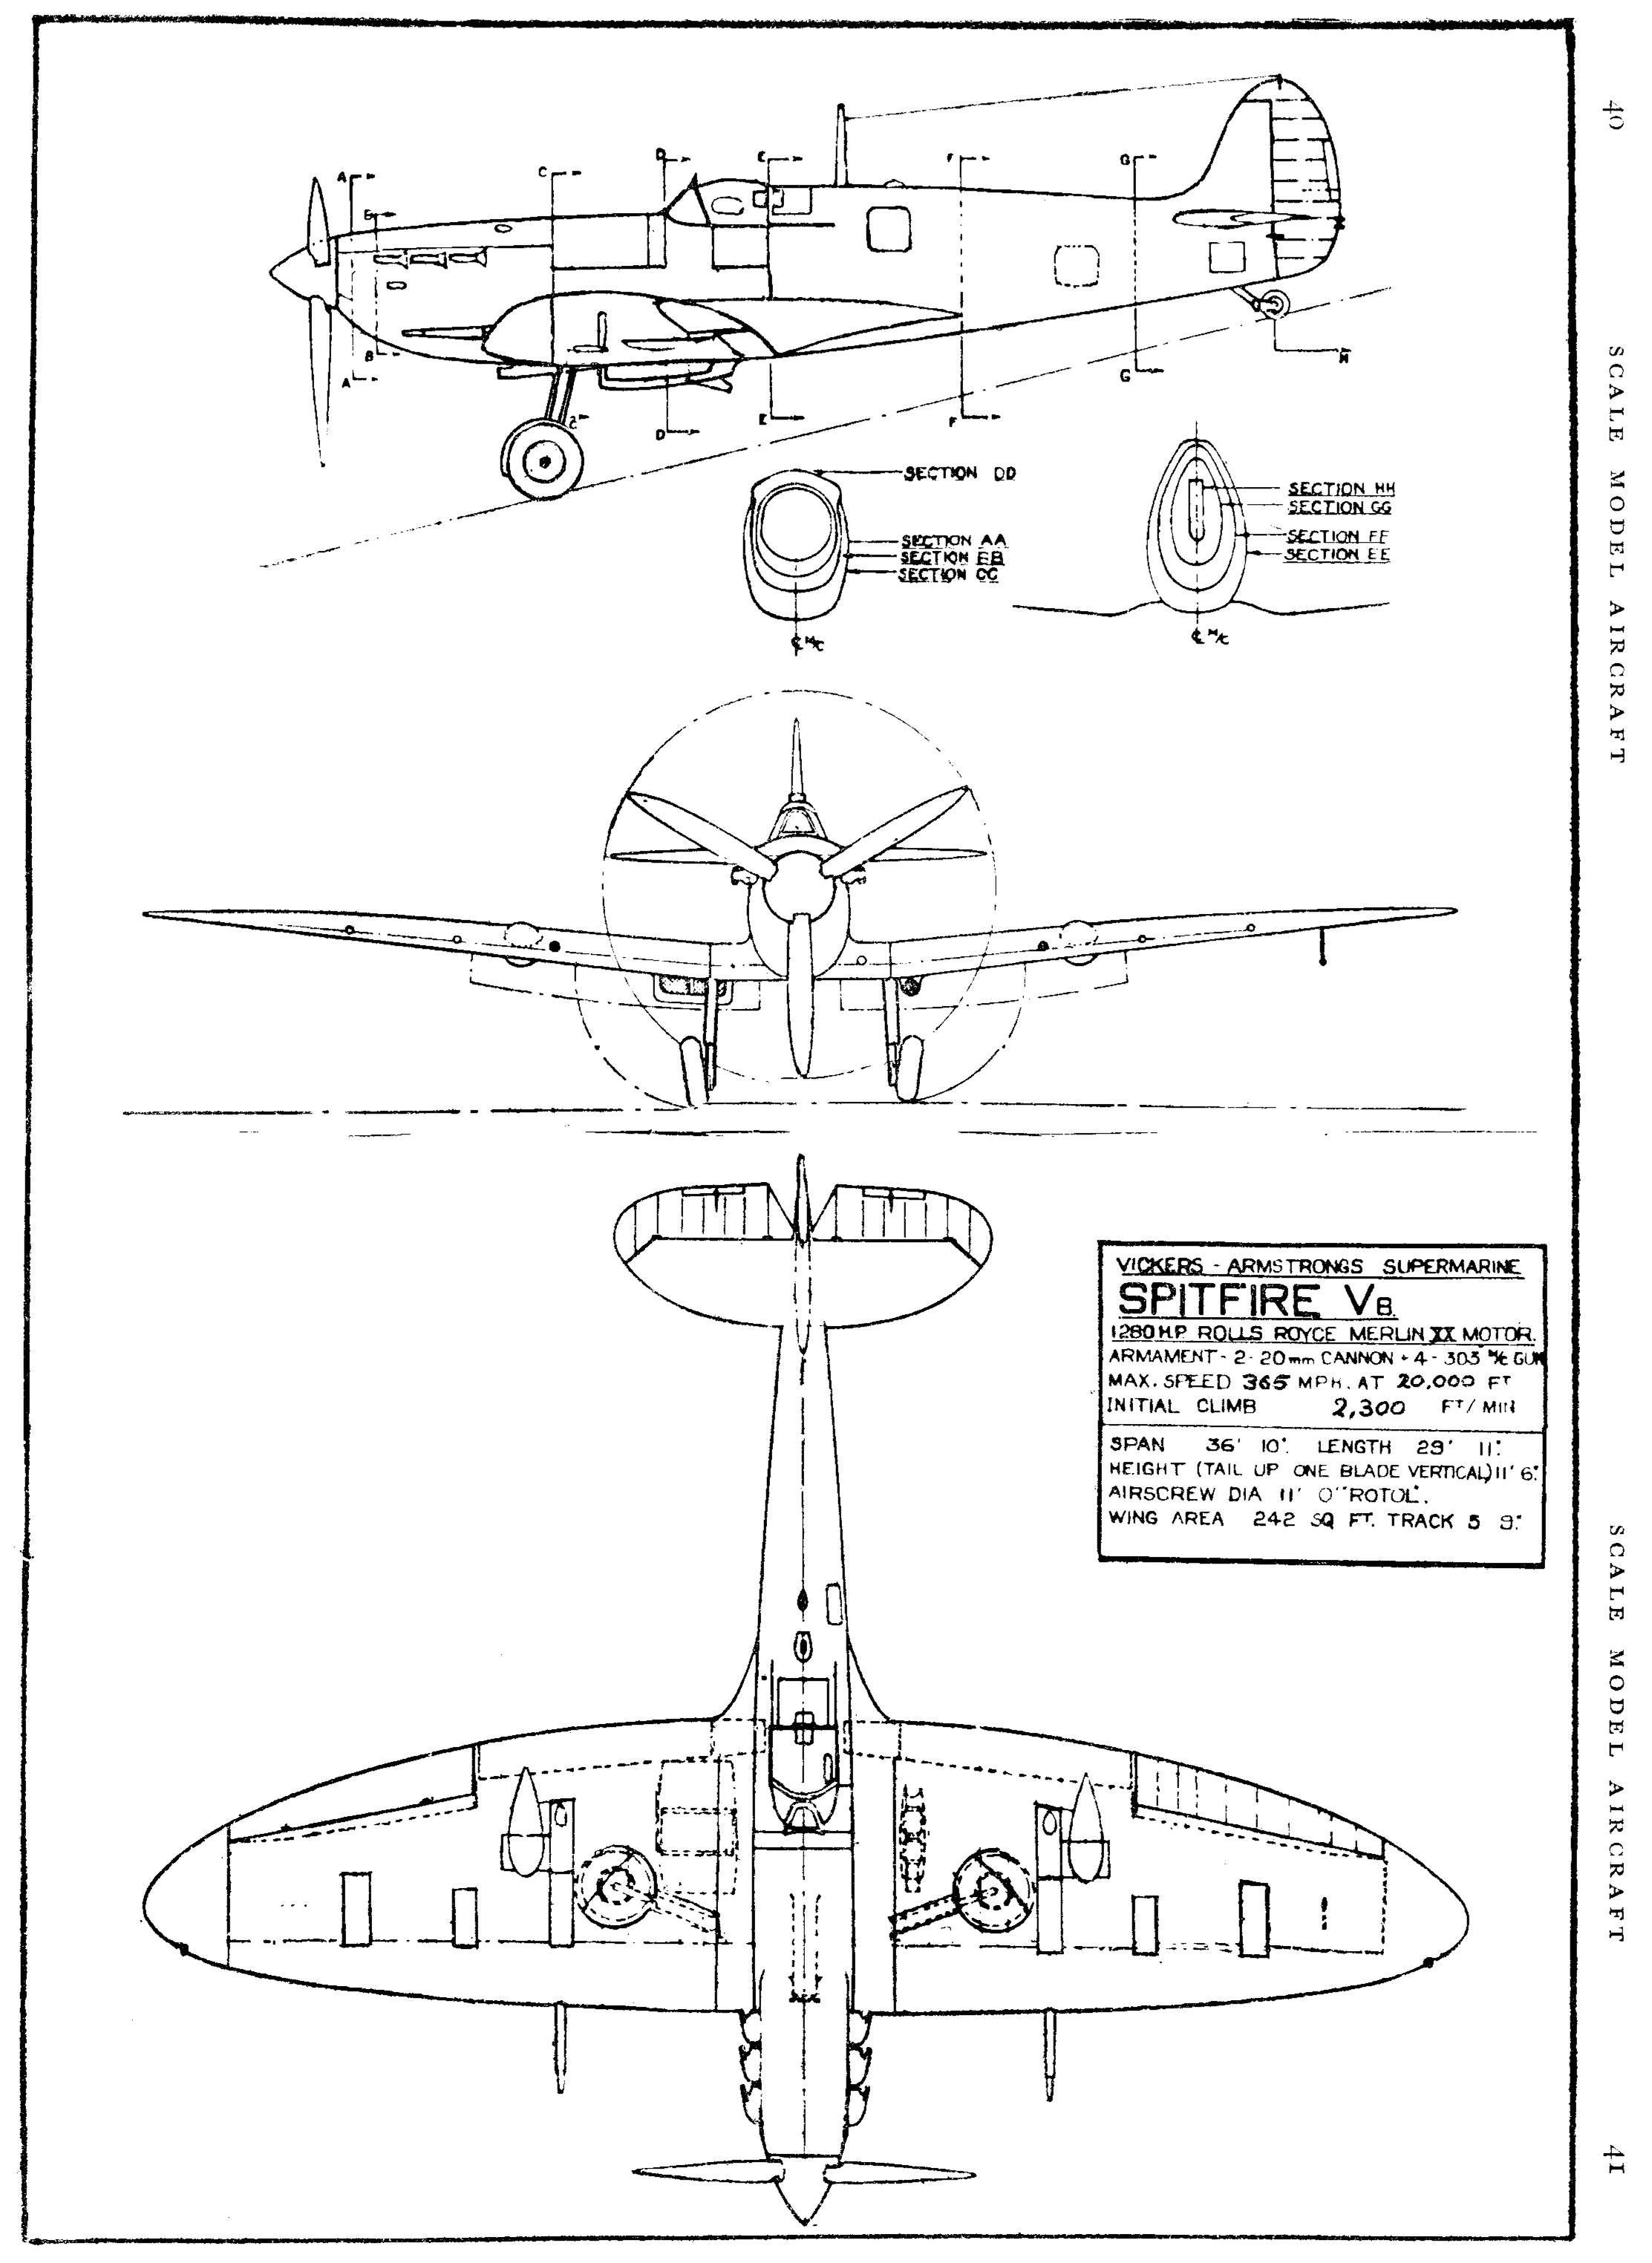 bush plane diagram best wiring library Aircraft Engine Schematics bush plane diagram wiring diagram portal dog planes diagram bush plane engine diagram